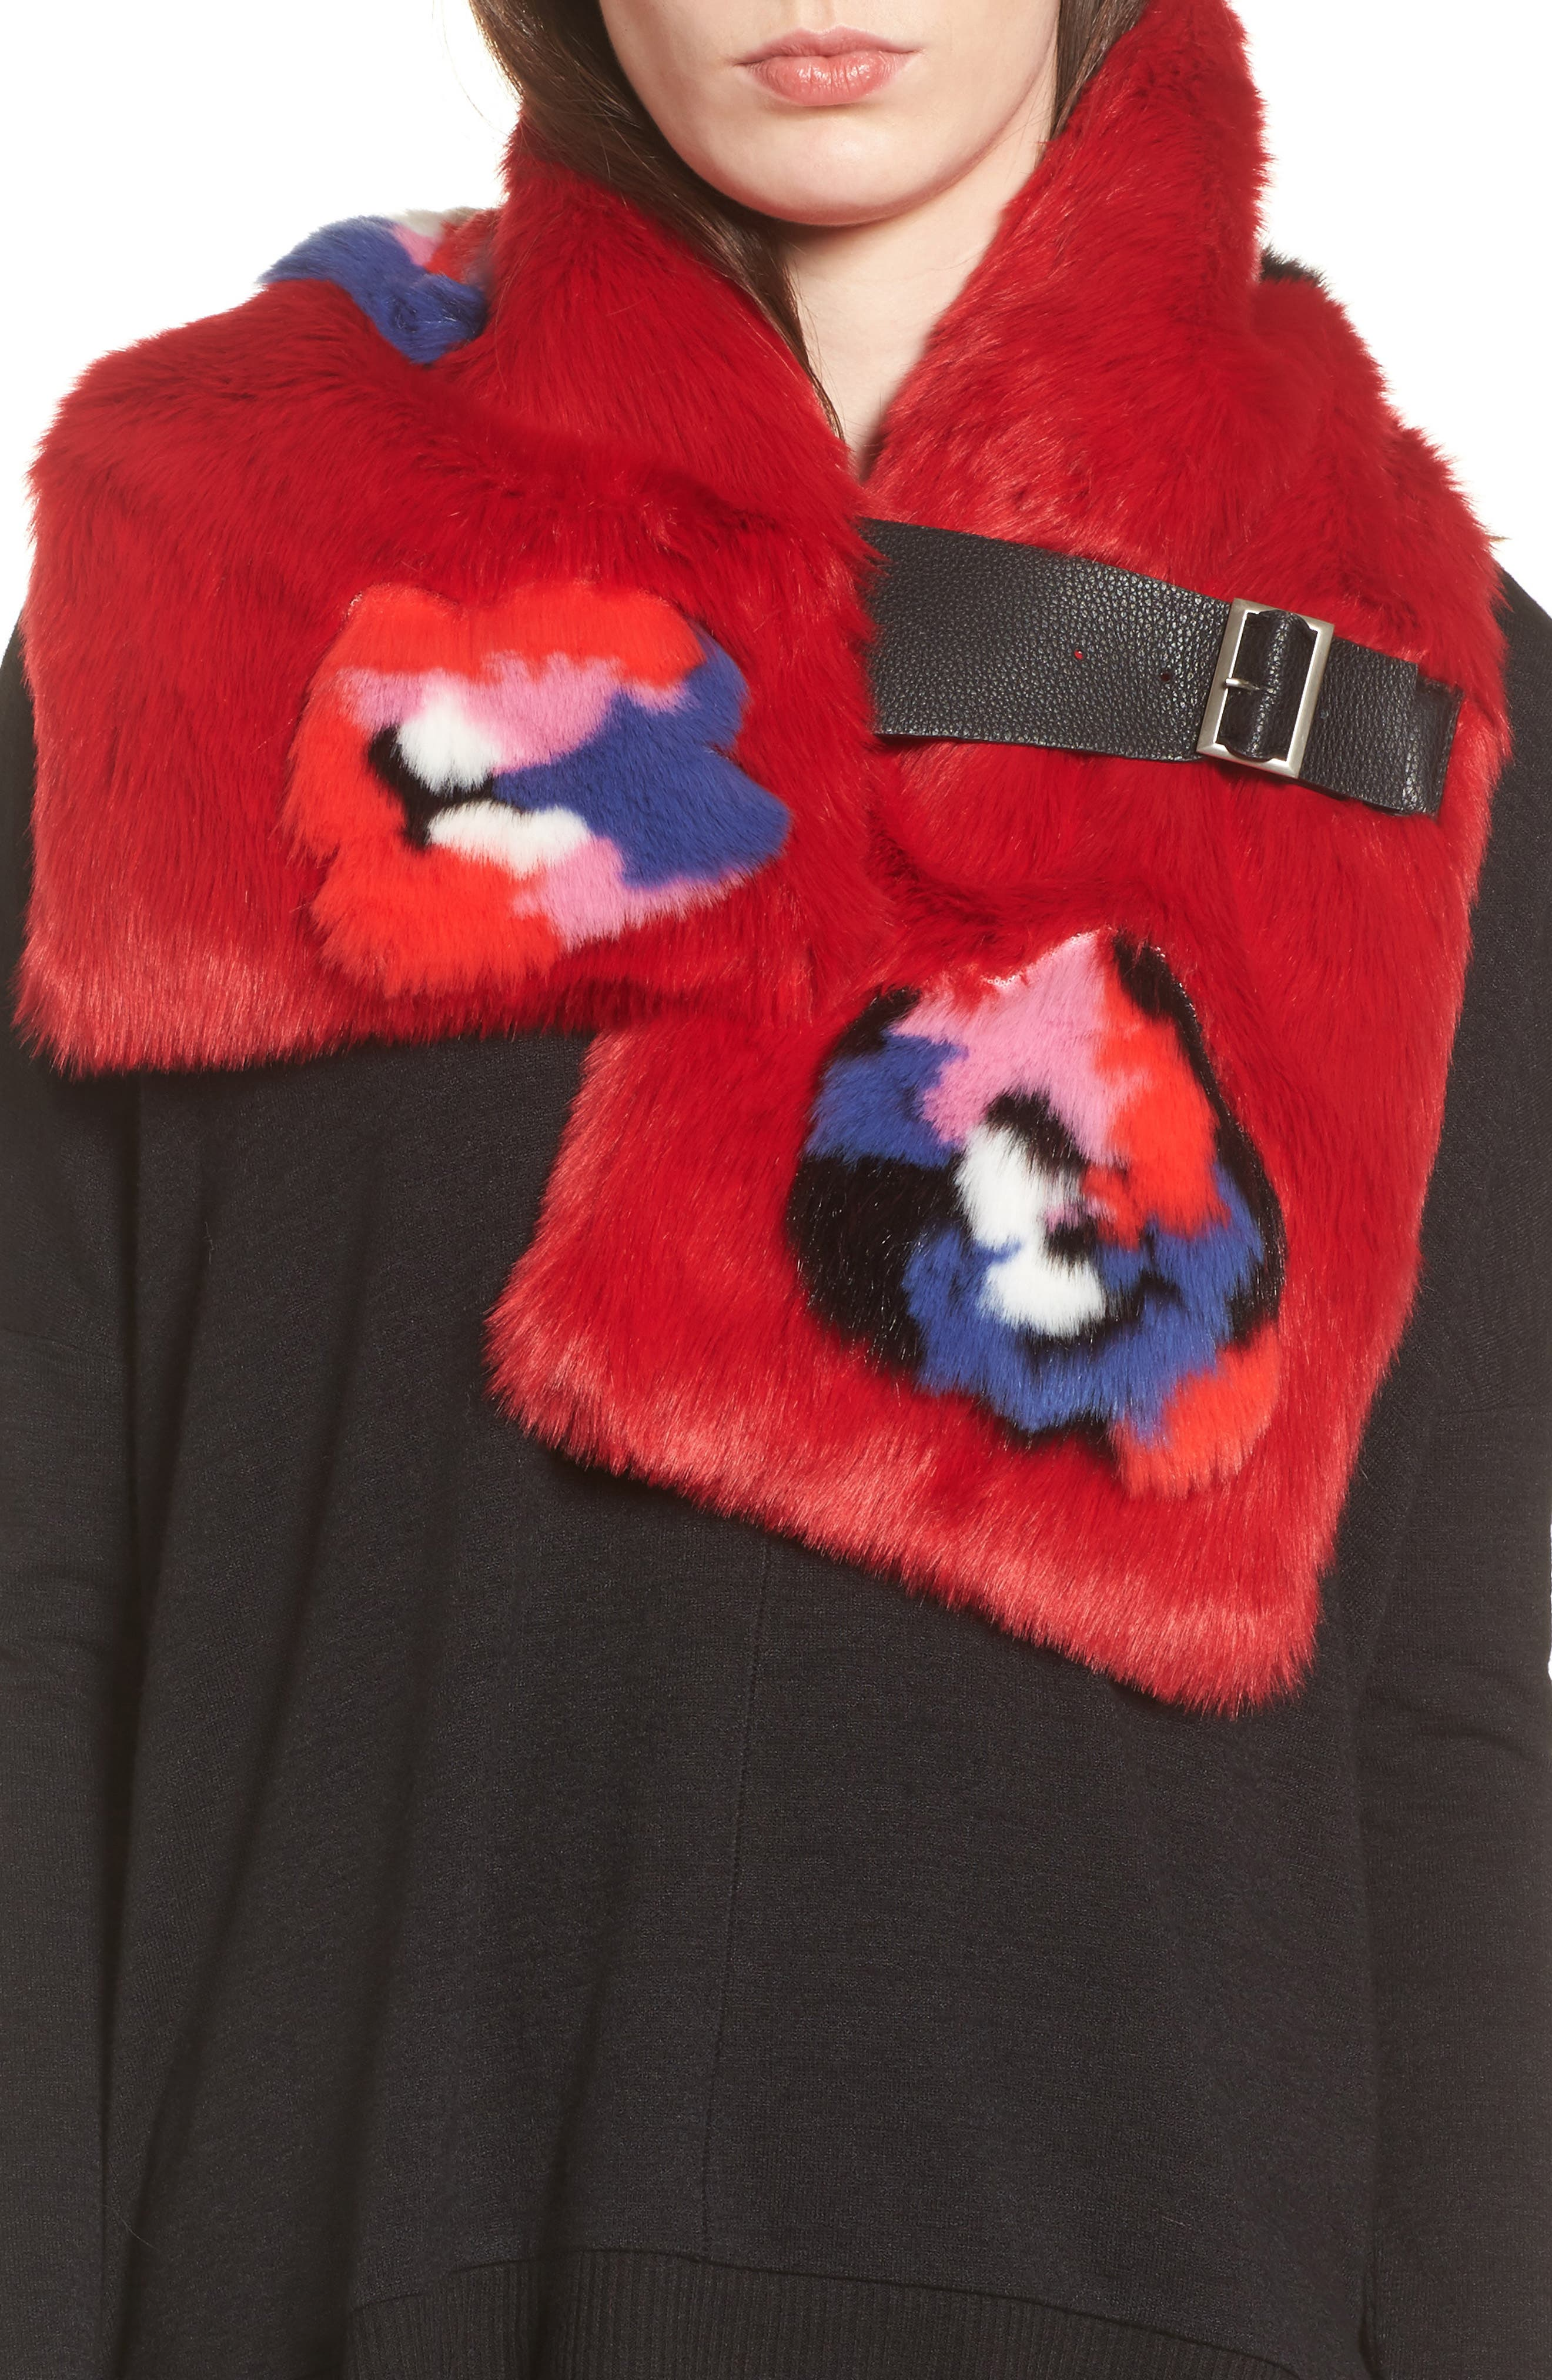 Main Image - Heurueh Buckled Faux Fur Scarf